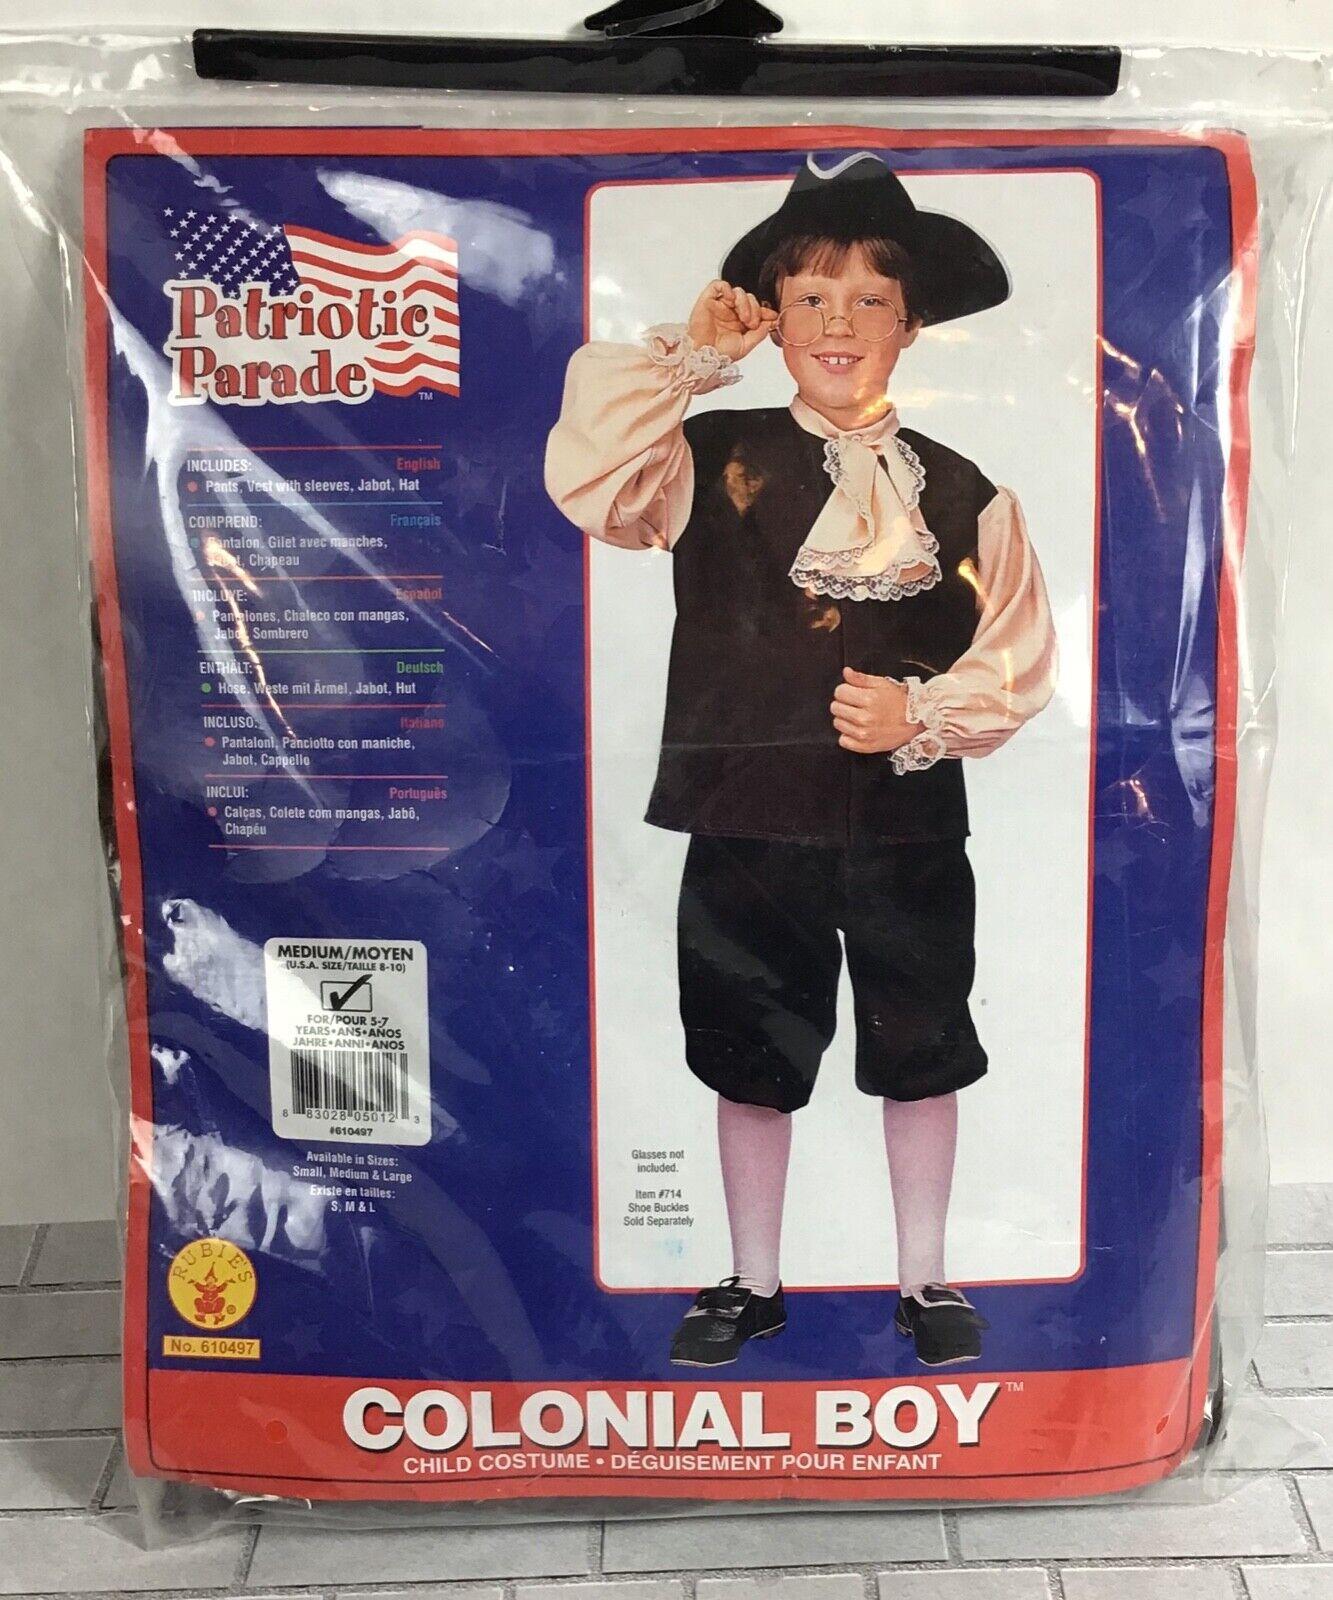 Colonial Boy Costume Minuteman Costume Rubies Kids Revolutionary War Era 10051